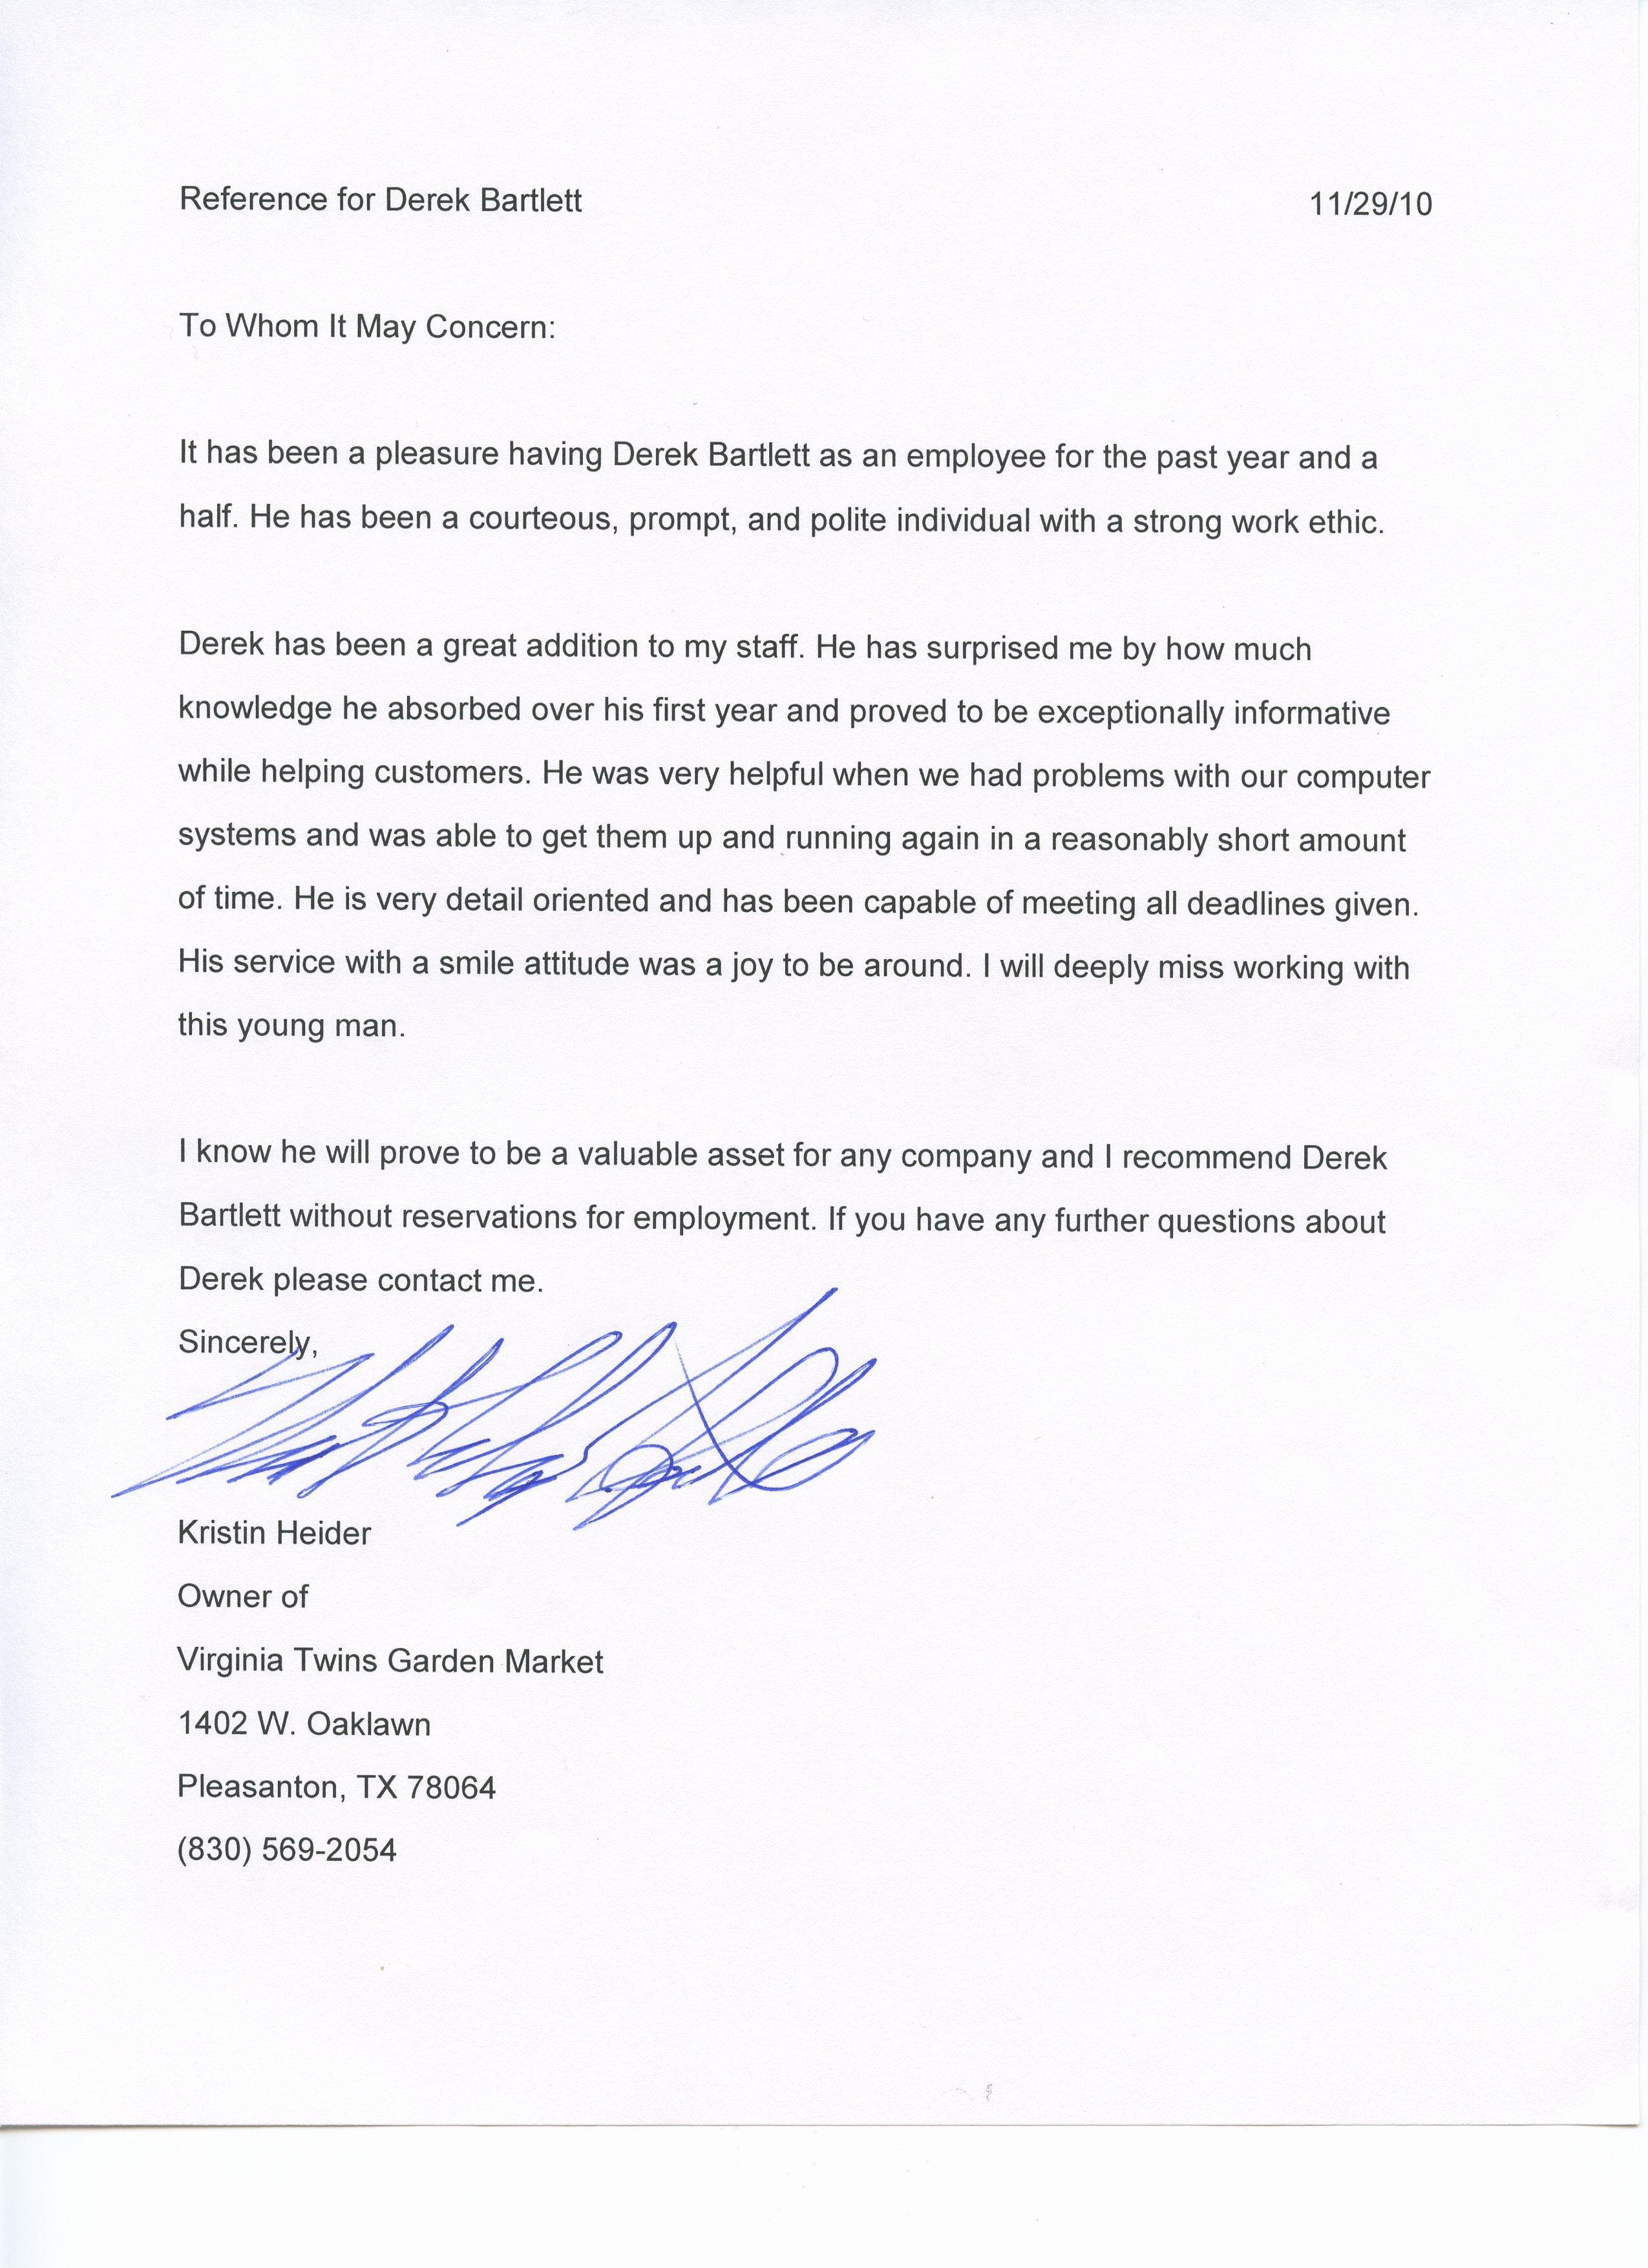 Virginia Tech Letter Of Recommendation Awesome Derek Bartlett Portfolio